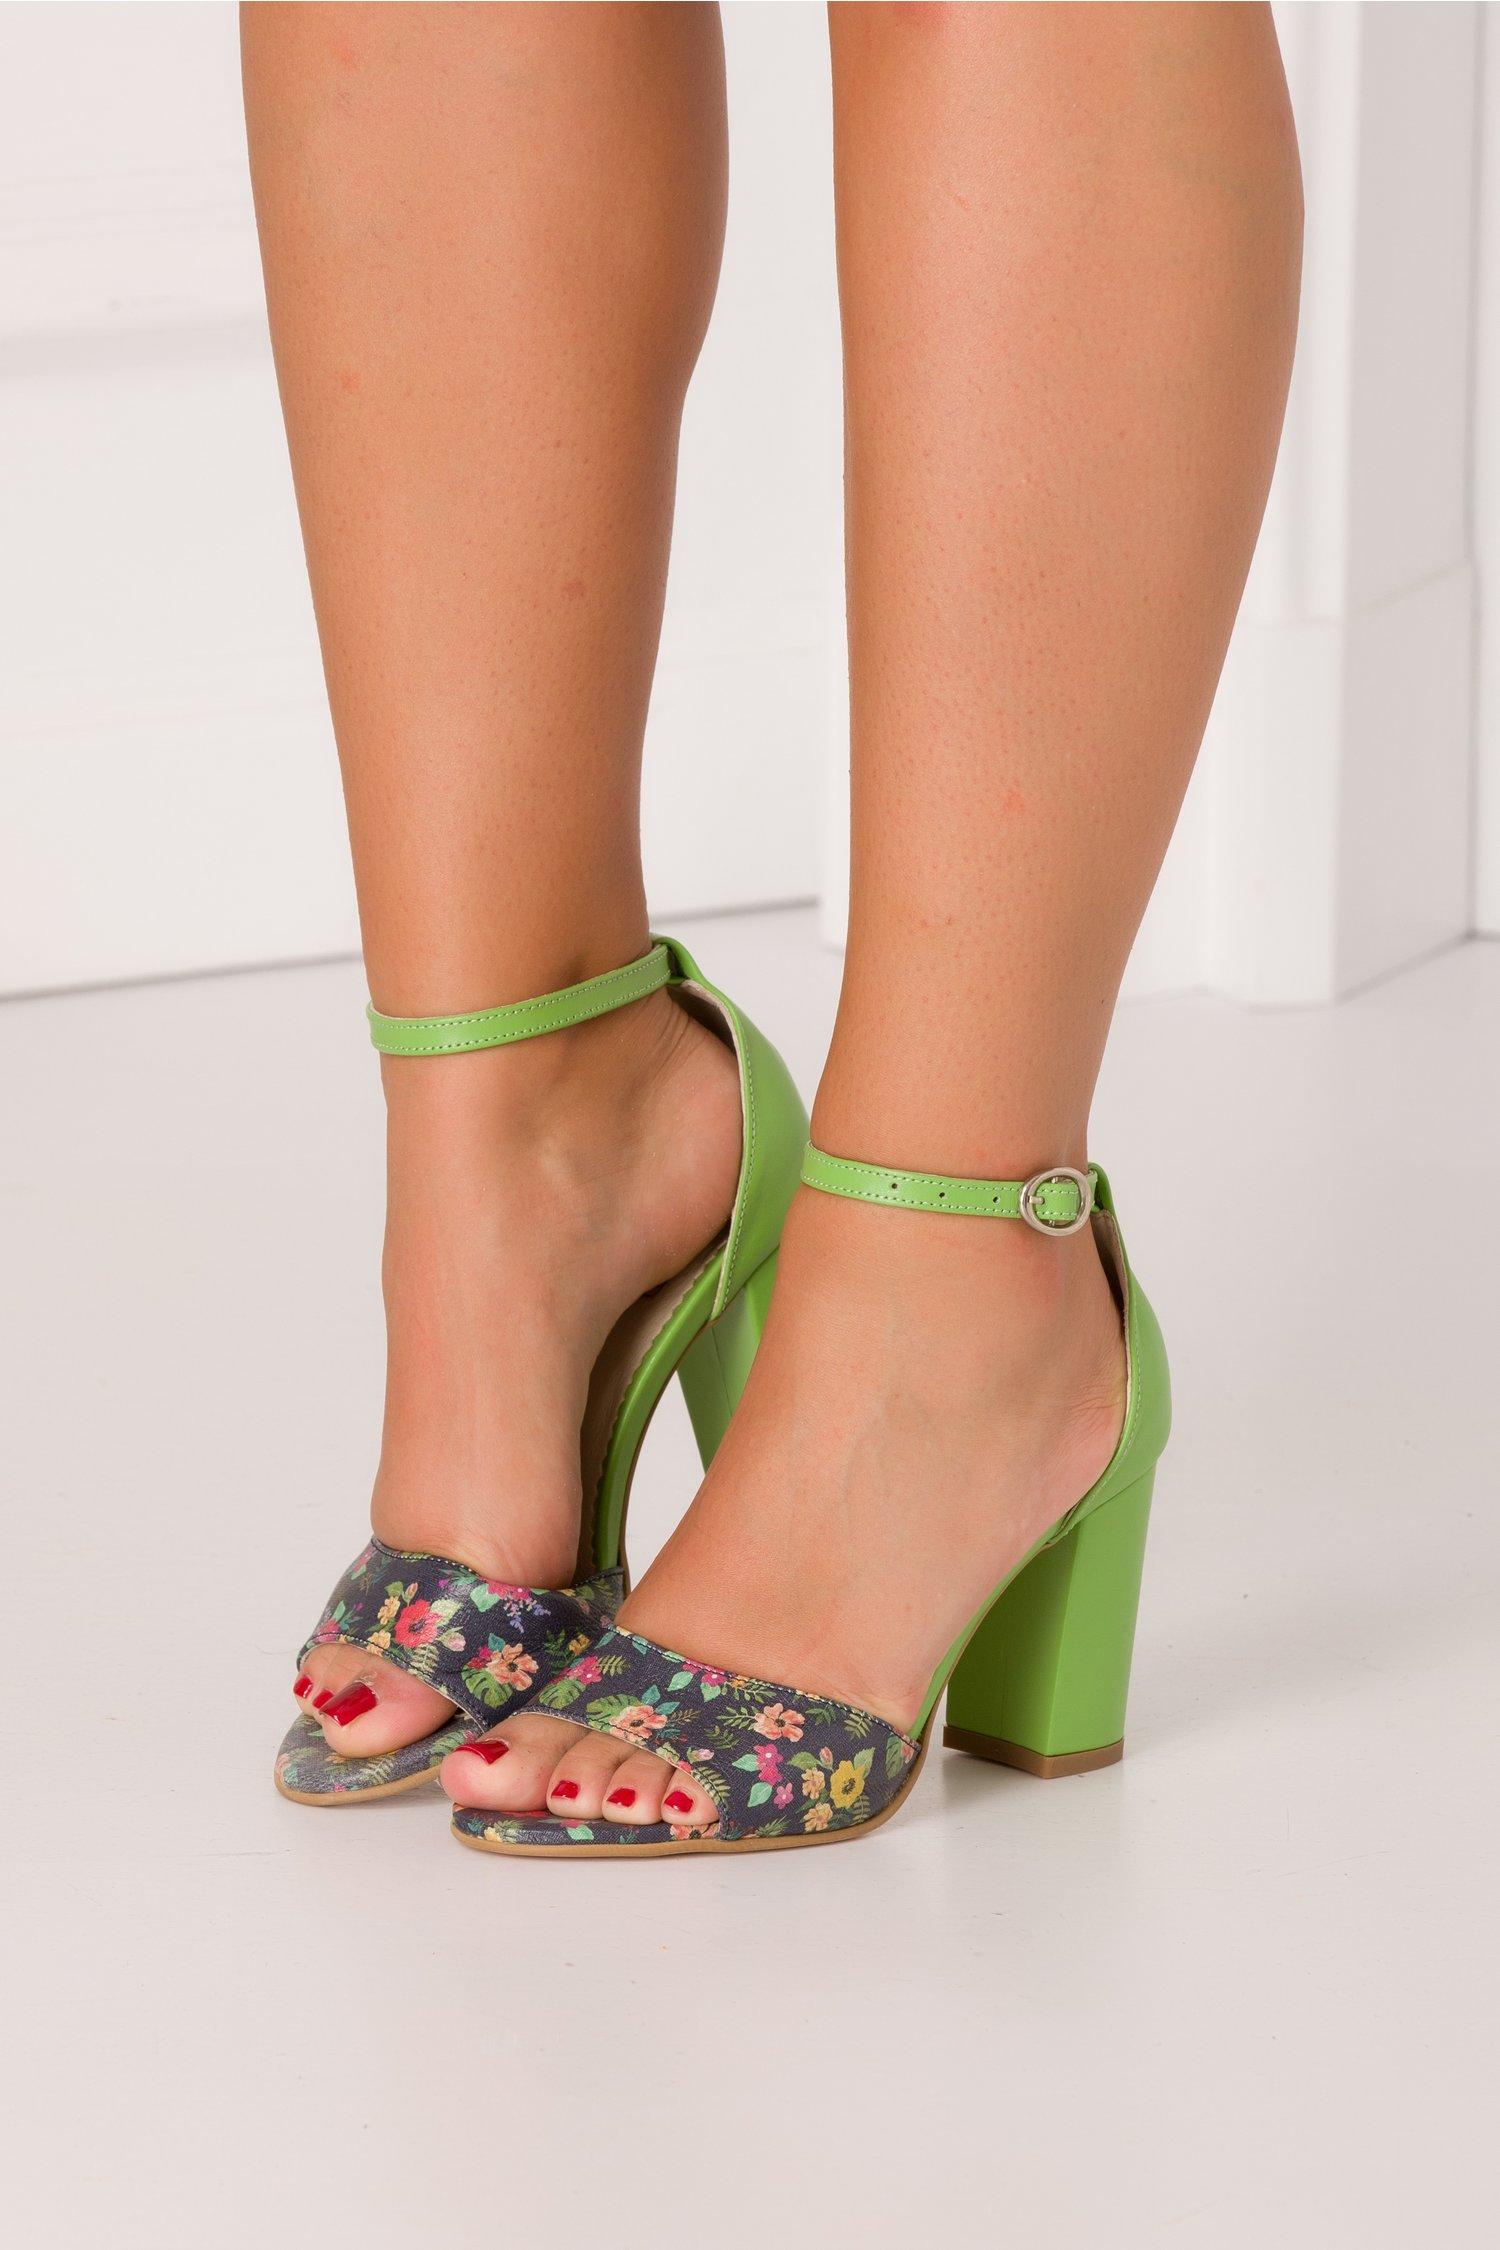 Sandale Debbie verde cu bleumarin si imprimeu floral